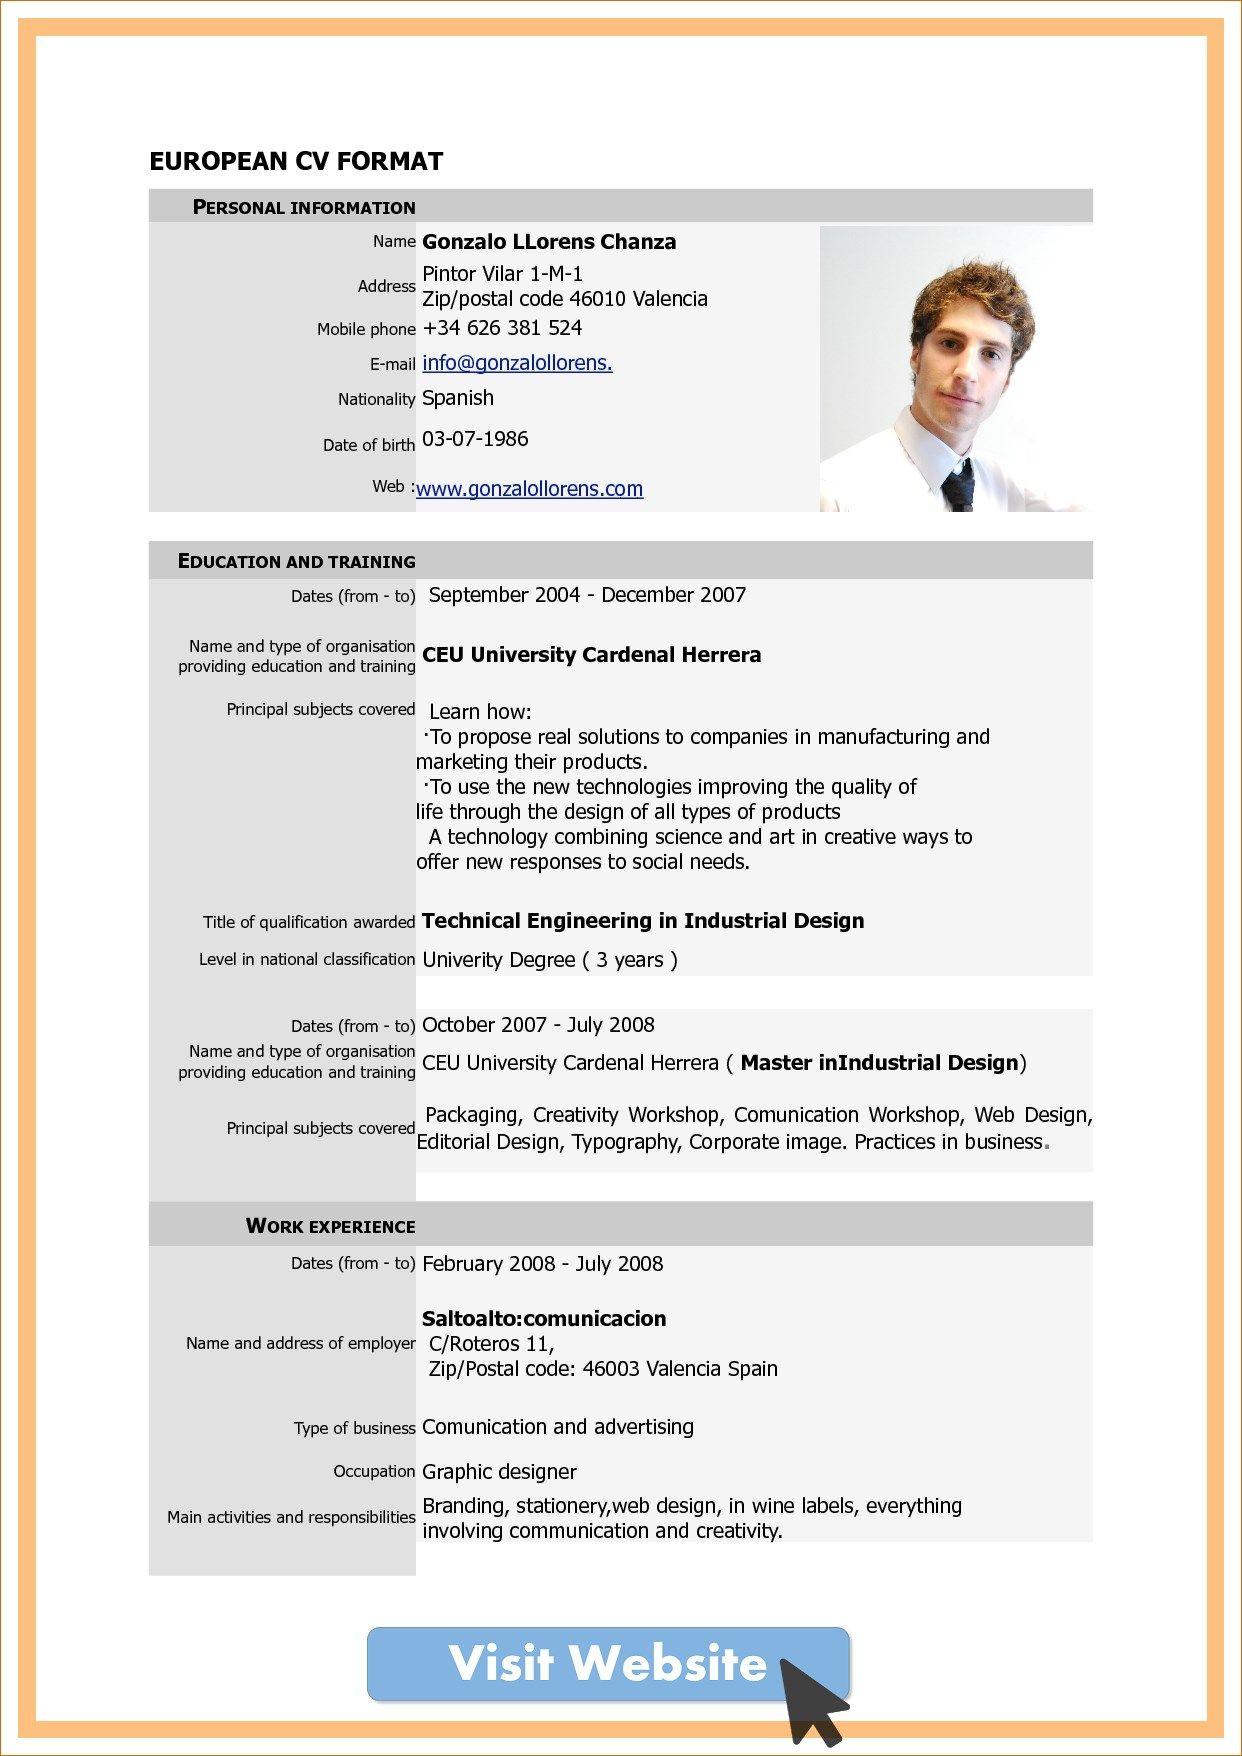 Biodata Format Marriage For Boy Download Cv Format Cv Format For Job Bio Data For Marriage